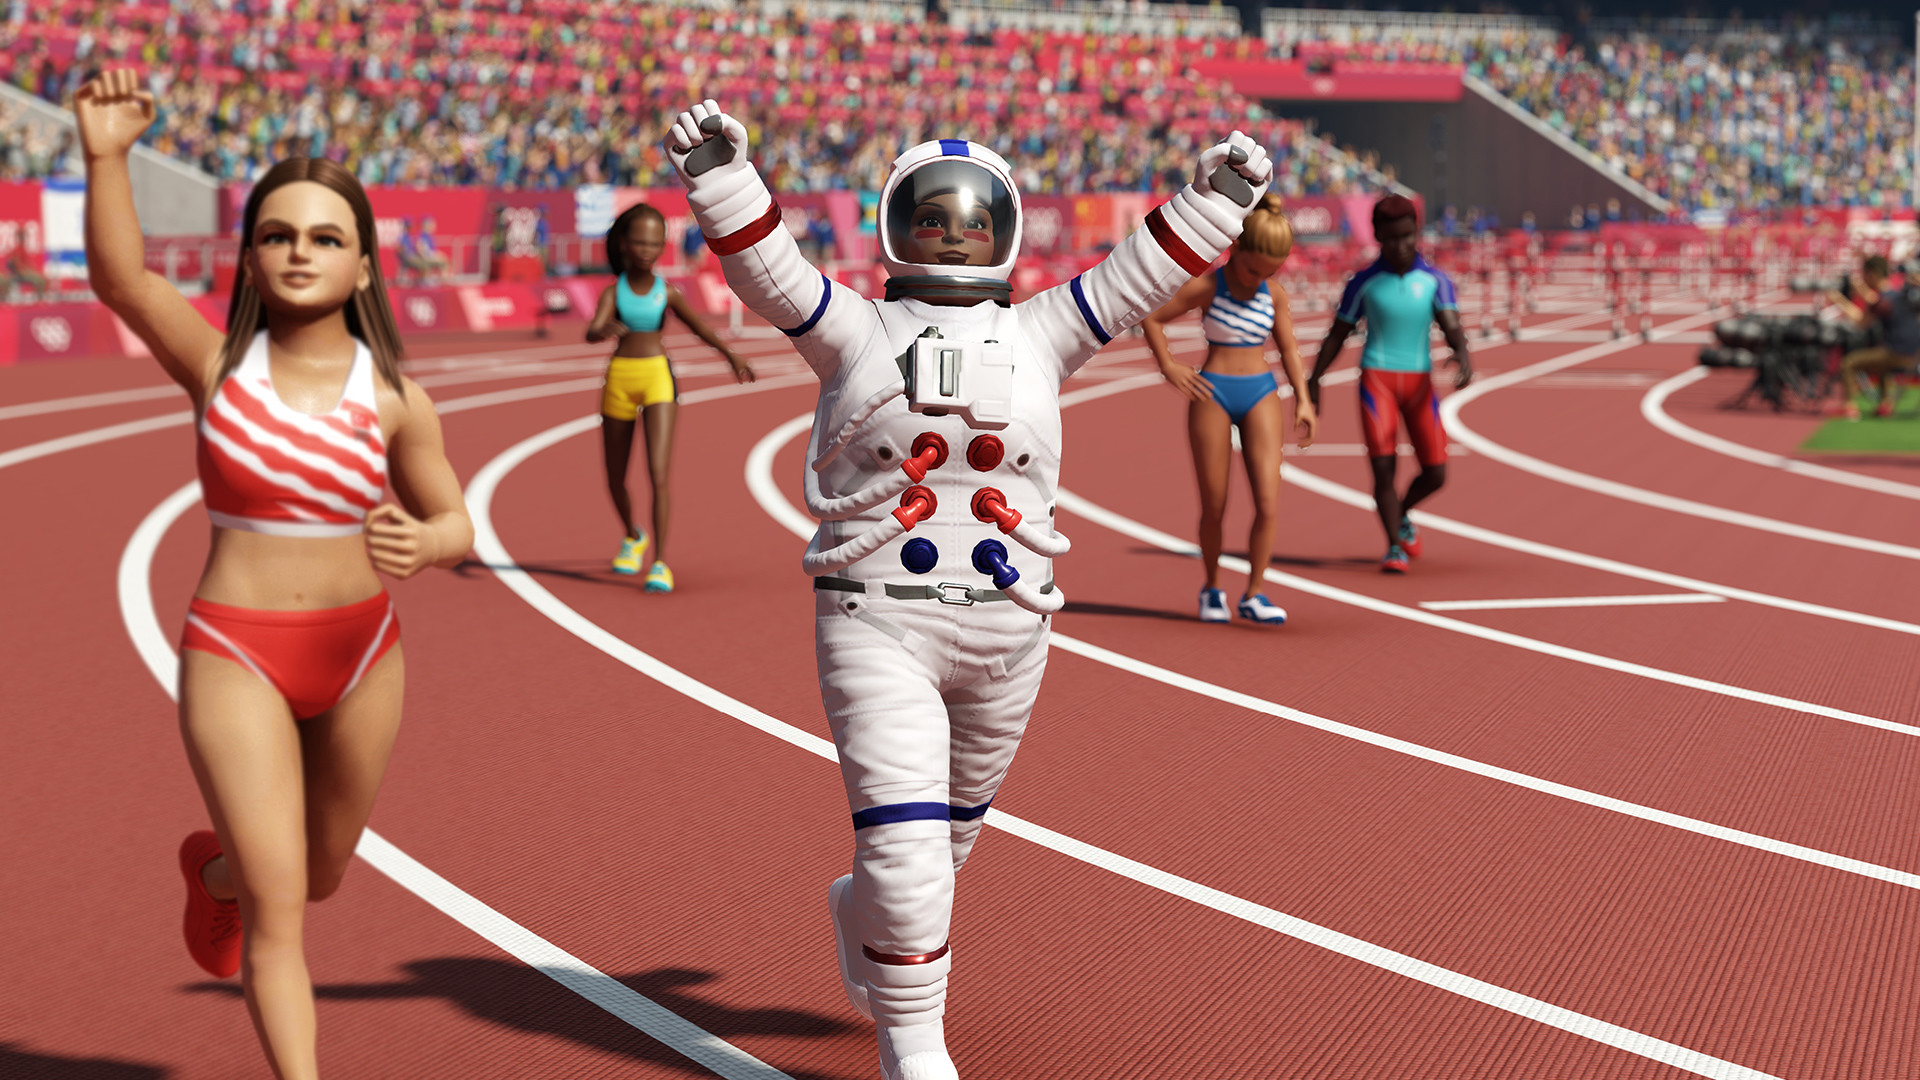 olympic-games-tokyo-2020-pc-screenshot-3